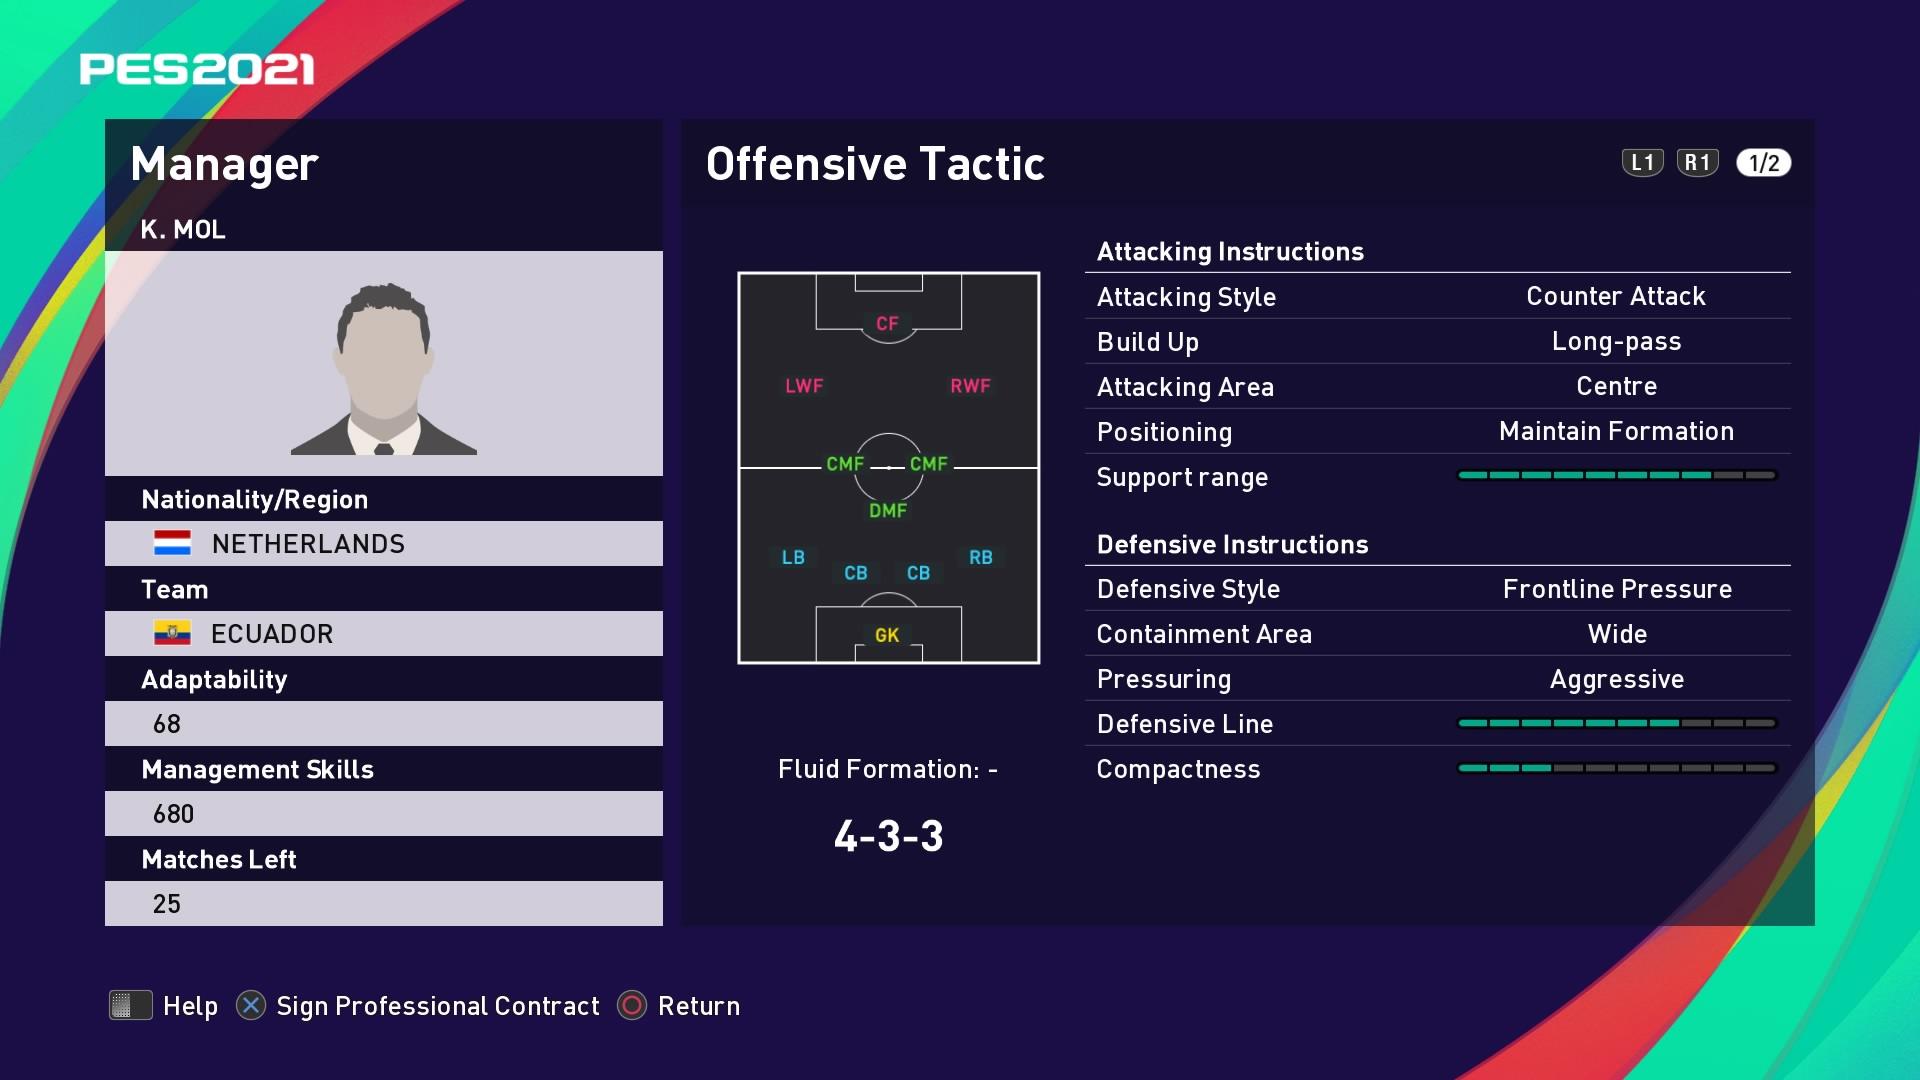 K. Mol (Jordi Cruyff) Offensive Tactic in PES 2021 myClub